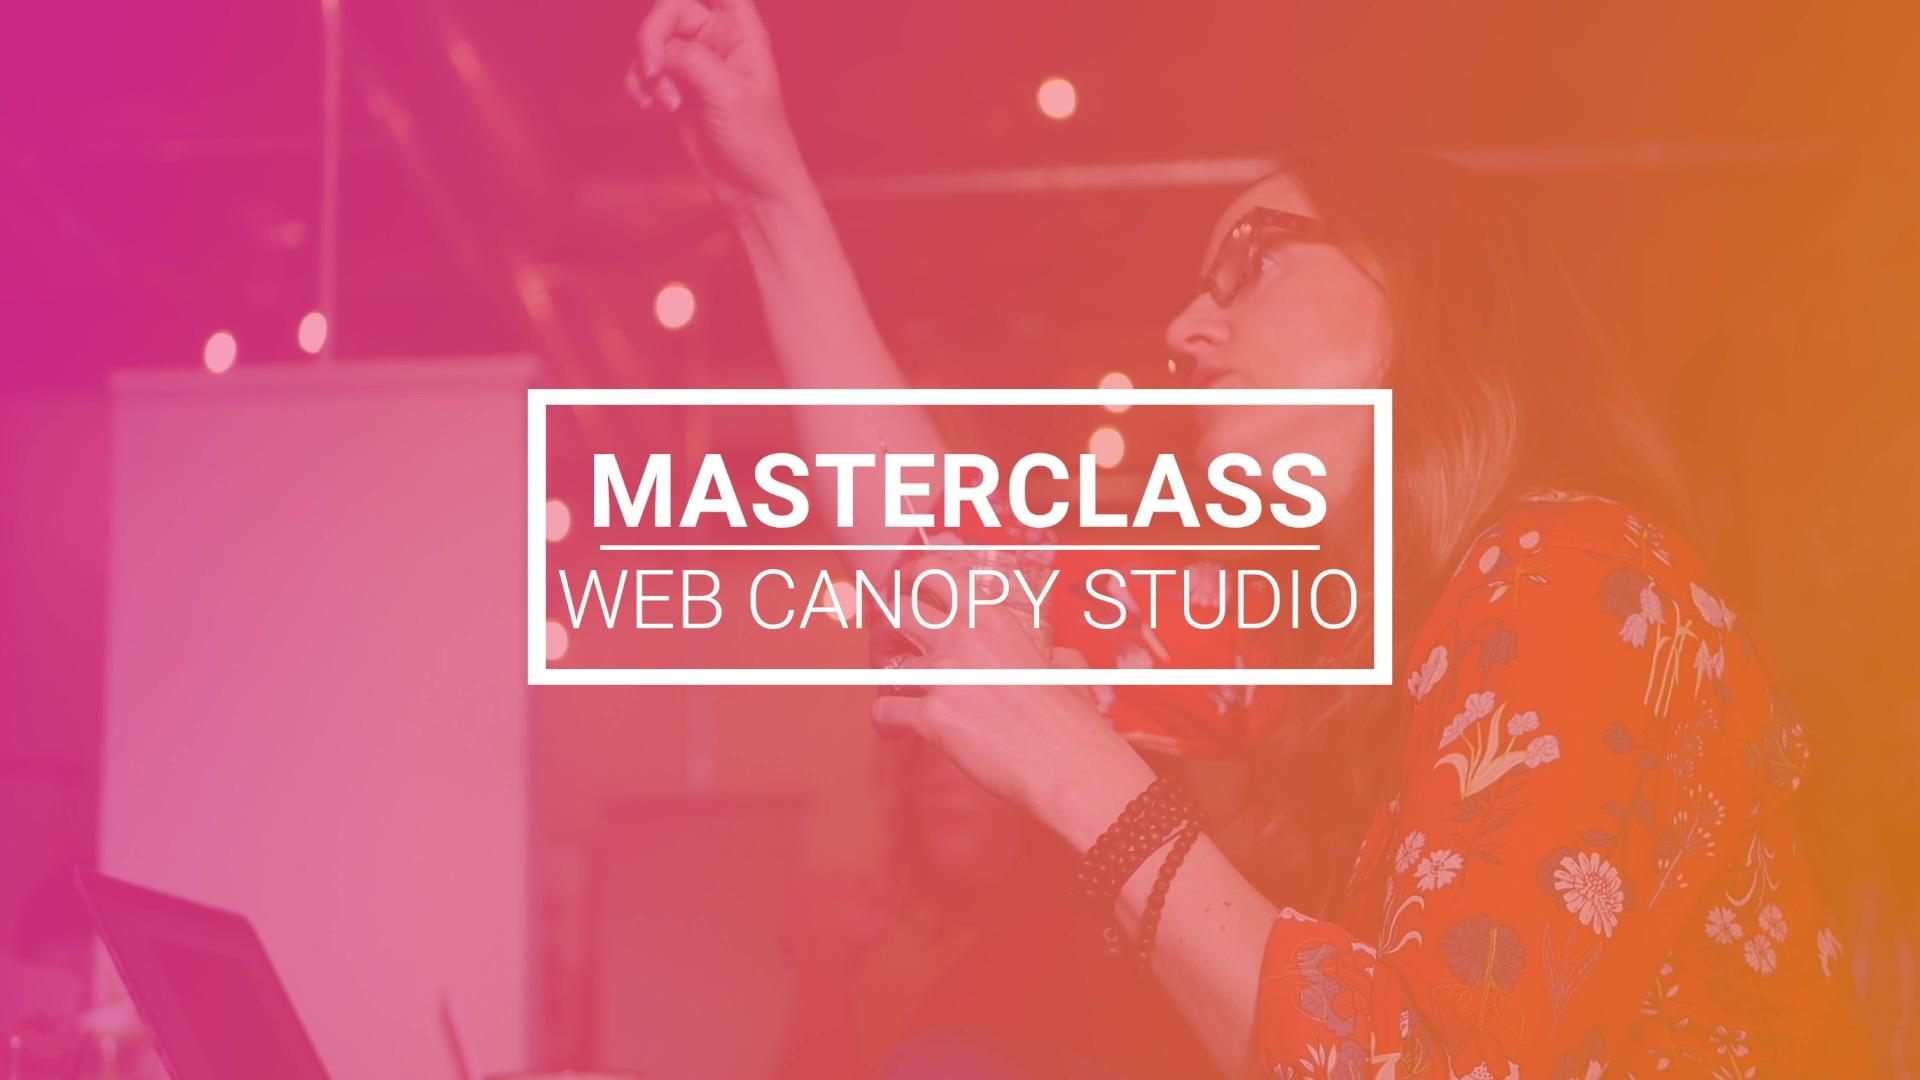 masterclass-ad